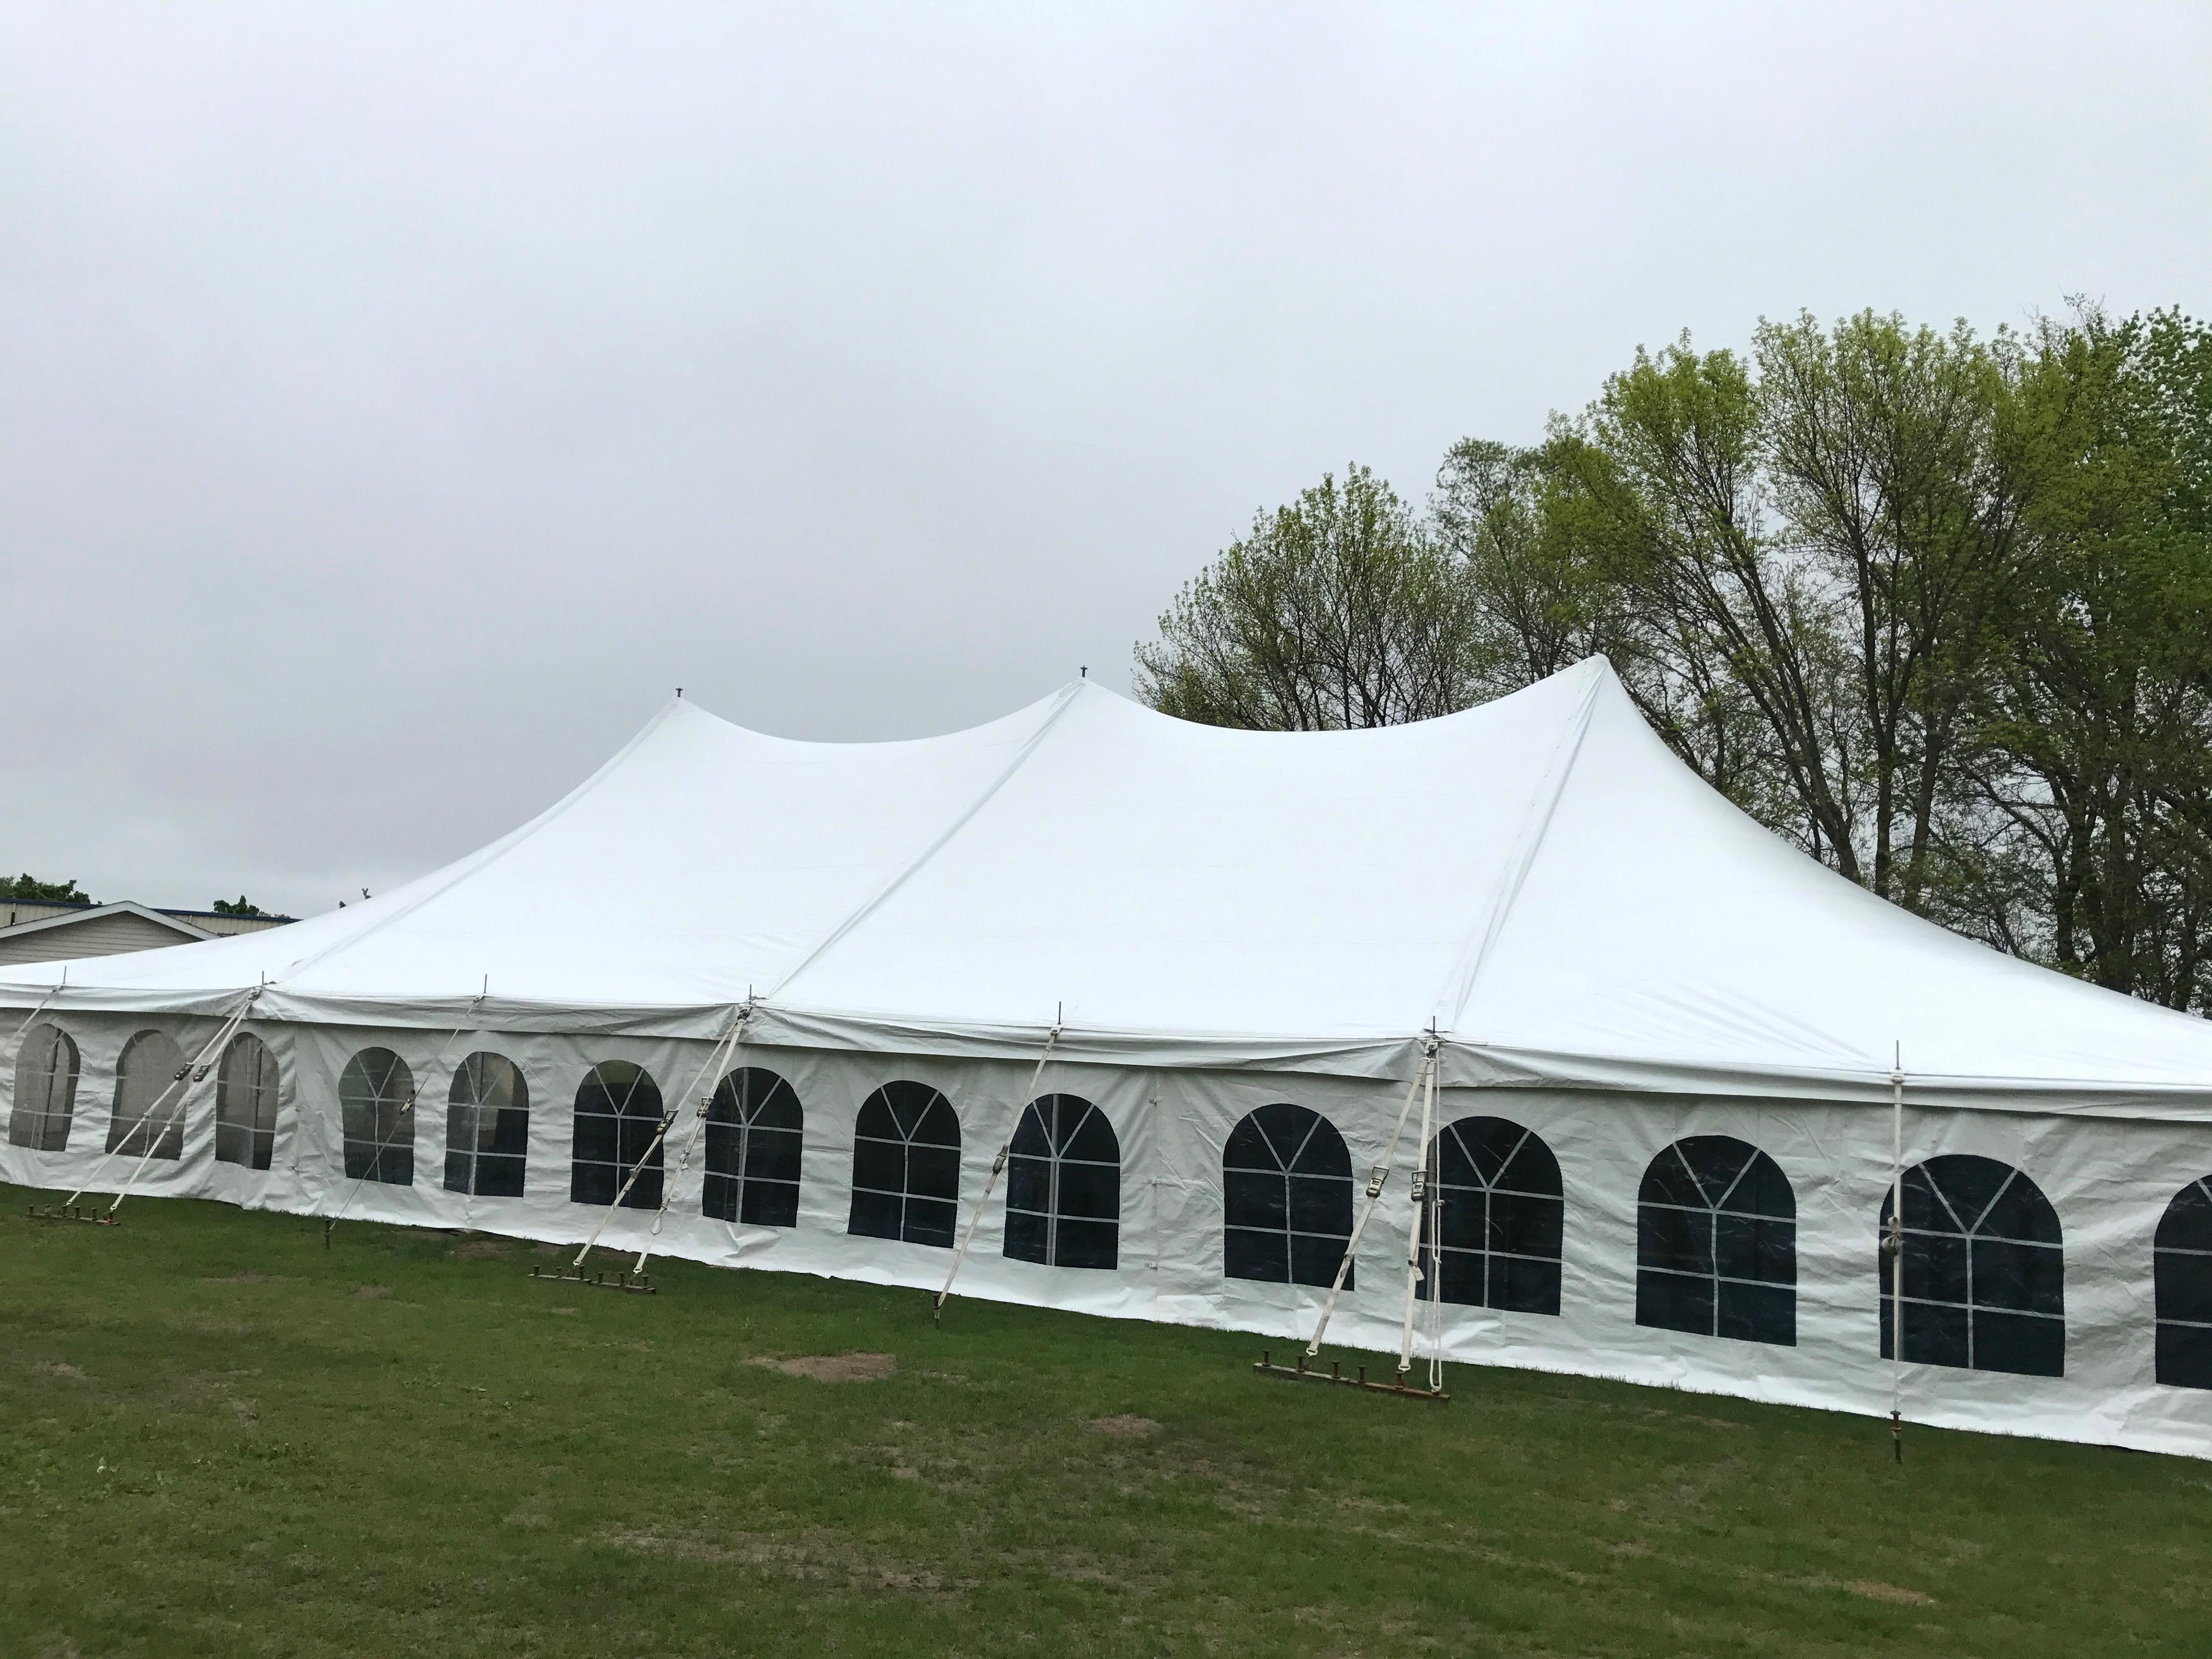 40u2032 x 80u2032 rope and pole tent 2707 Dubuque St Ne North LibertyIowa 4-26-2017 & 40u0027 x 80u0027 rope and pole tent 2707 Dubuque St Ne North Liberty ...